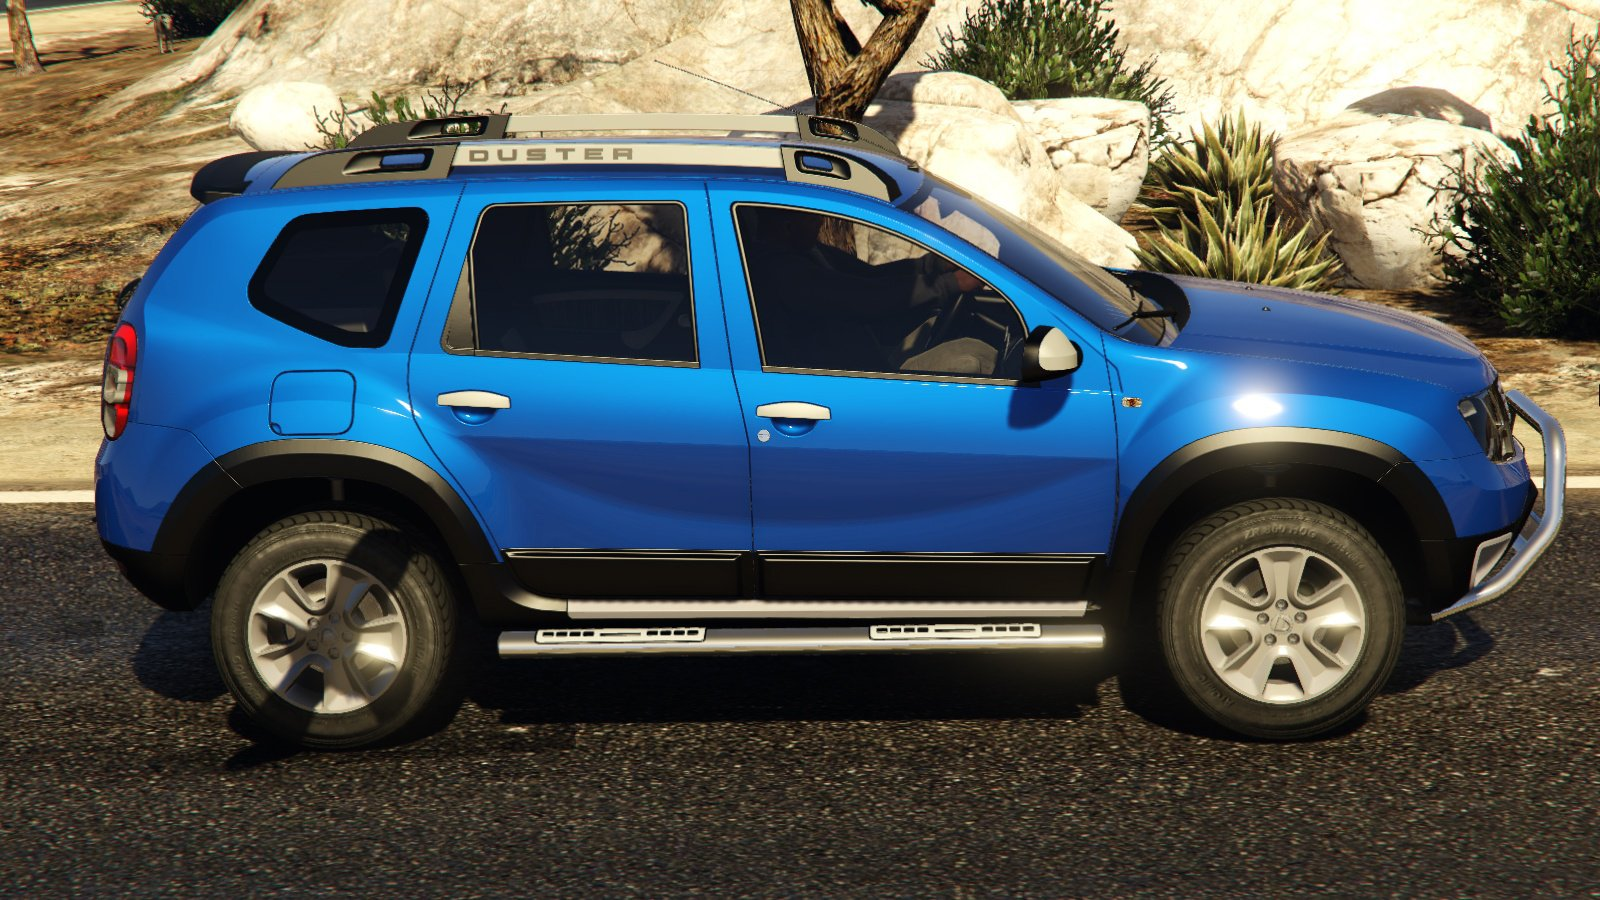 Dacia Duster 2014 Vehicules Pour Gta V Sur Gta Modding